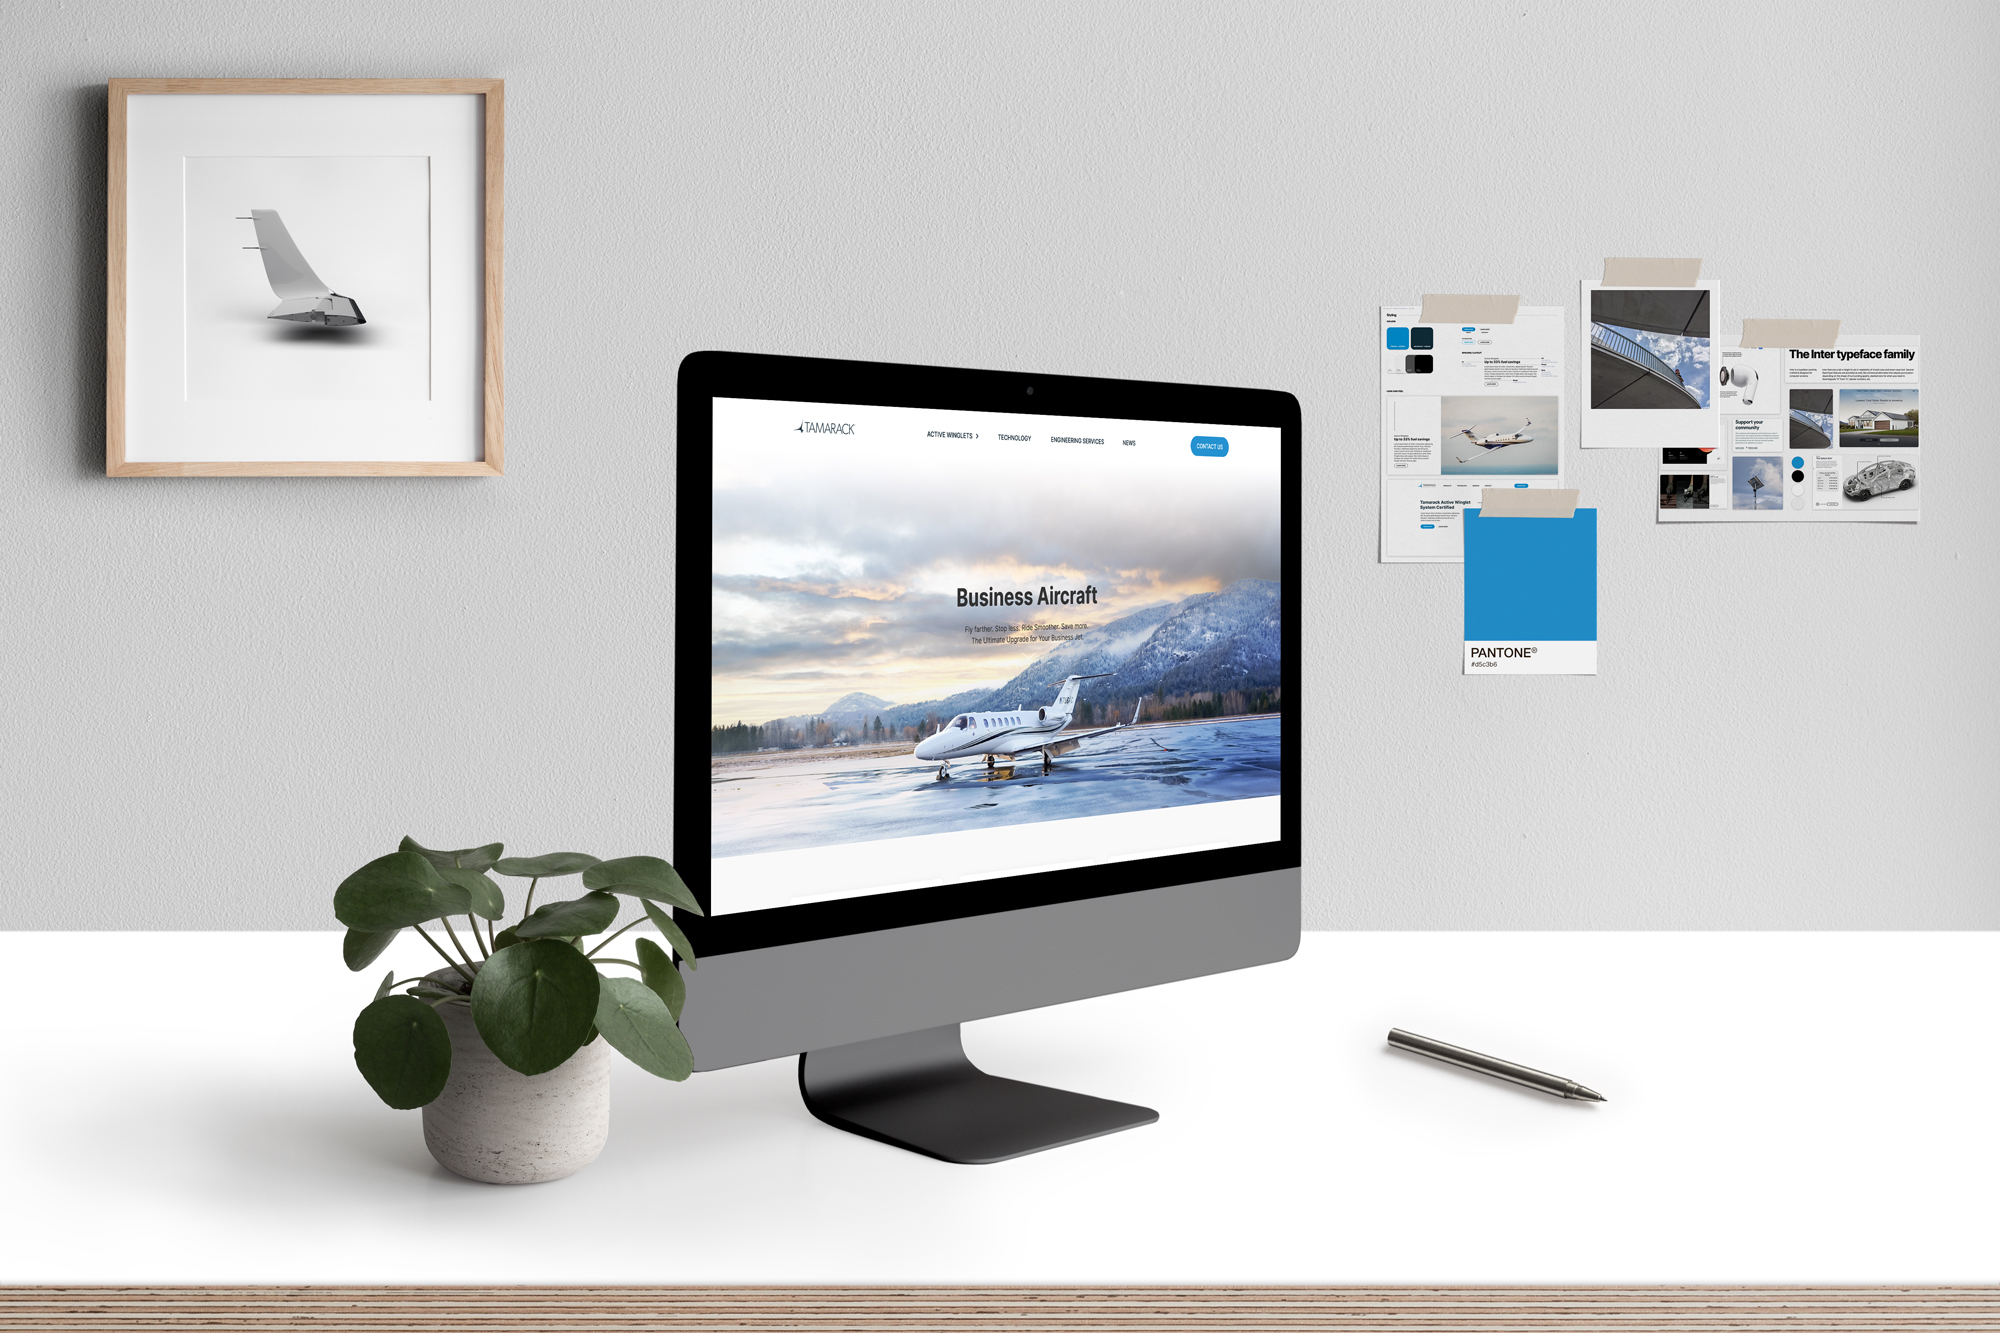 desktop computer with Tamarack Aerospace's new website up, built by Good & Gold Marketing